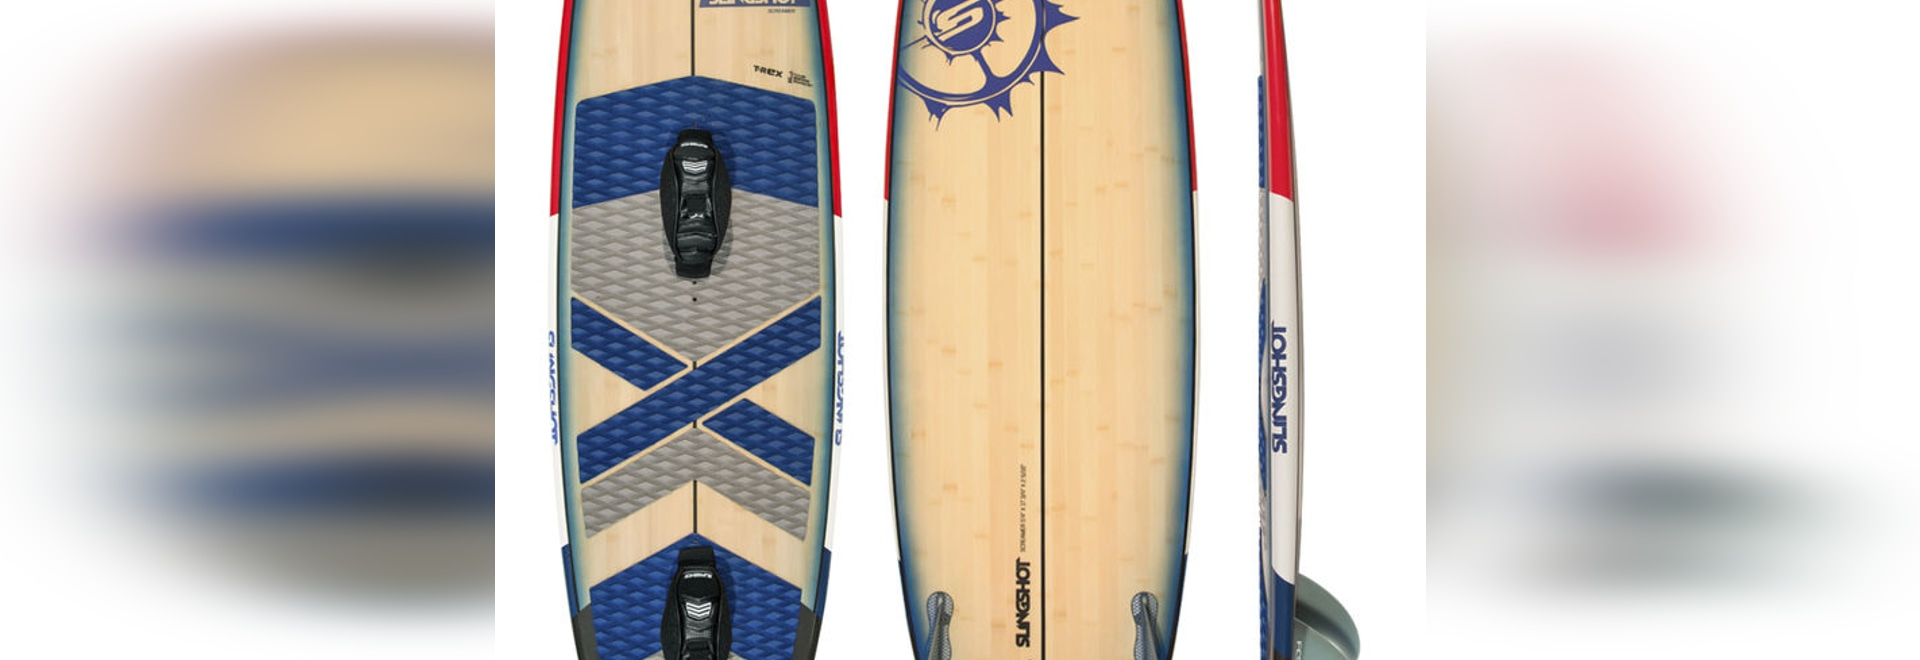 NEW: surf kiteboard by SlingShot